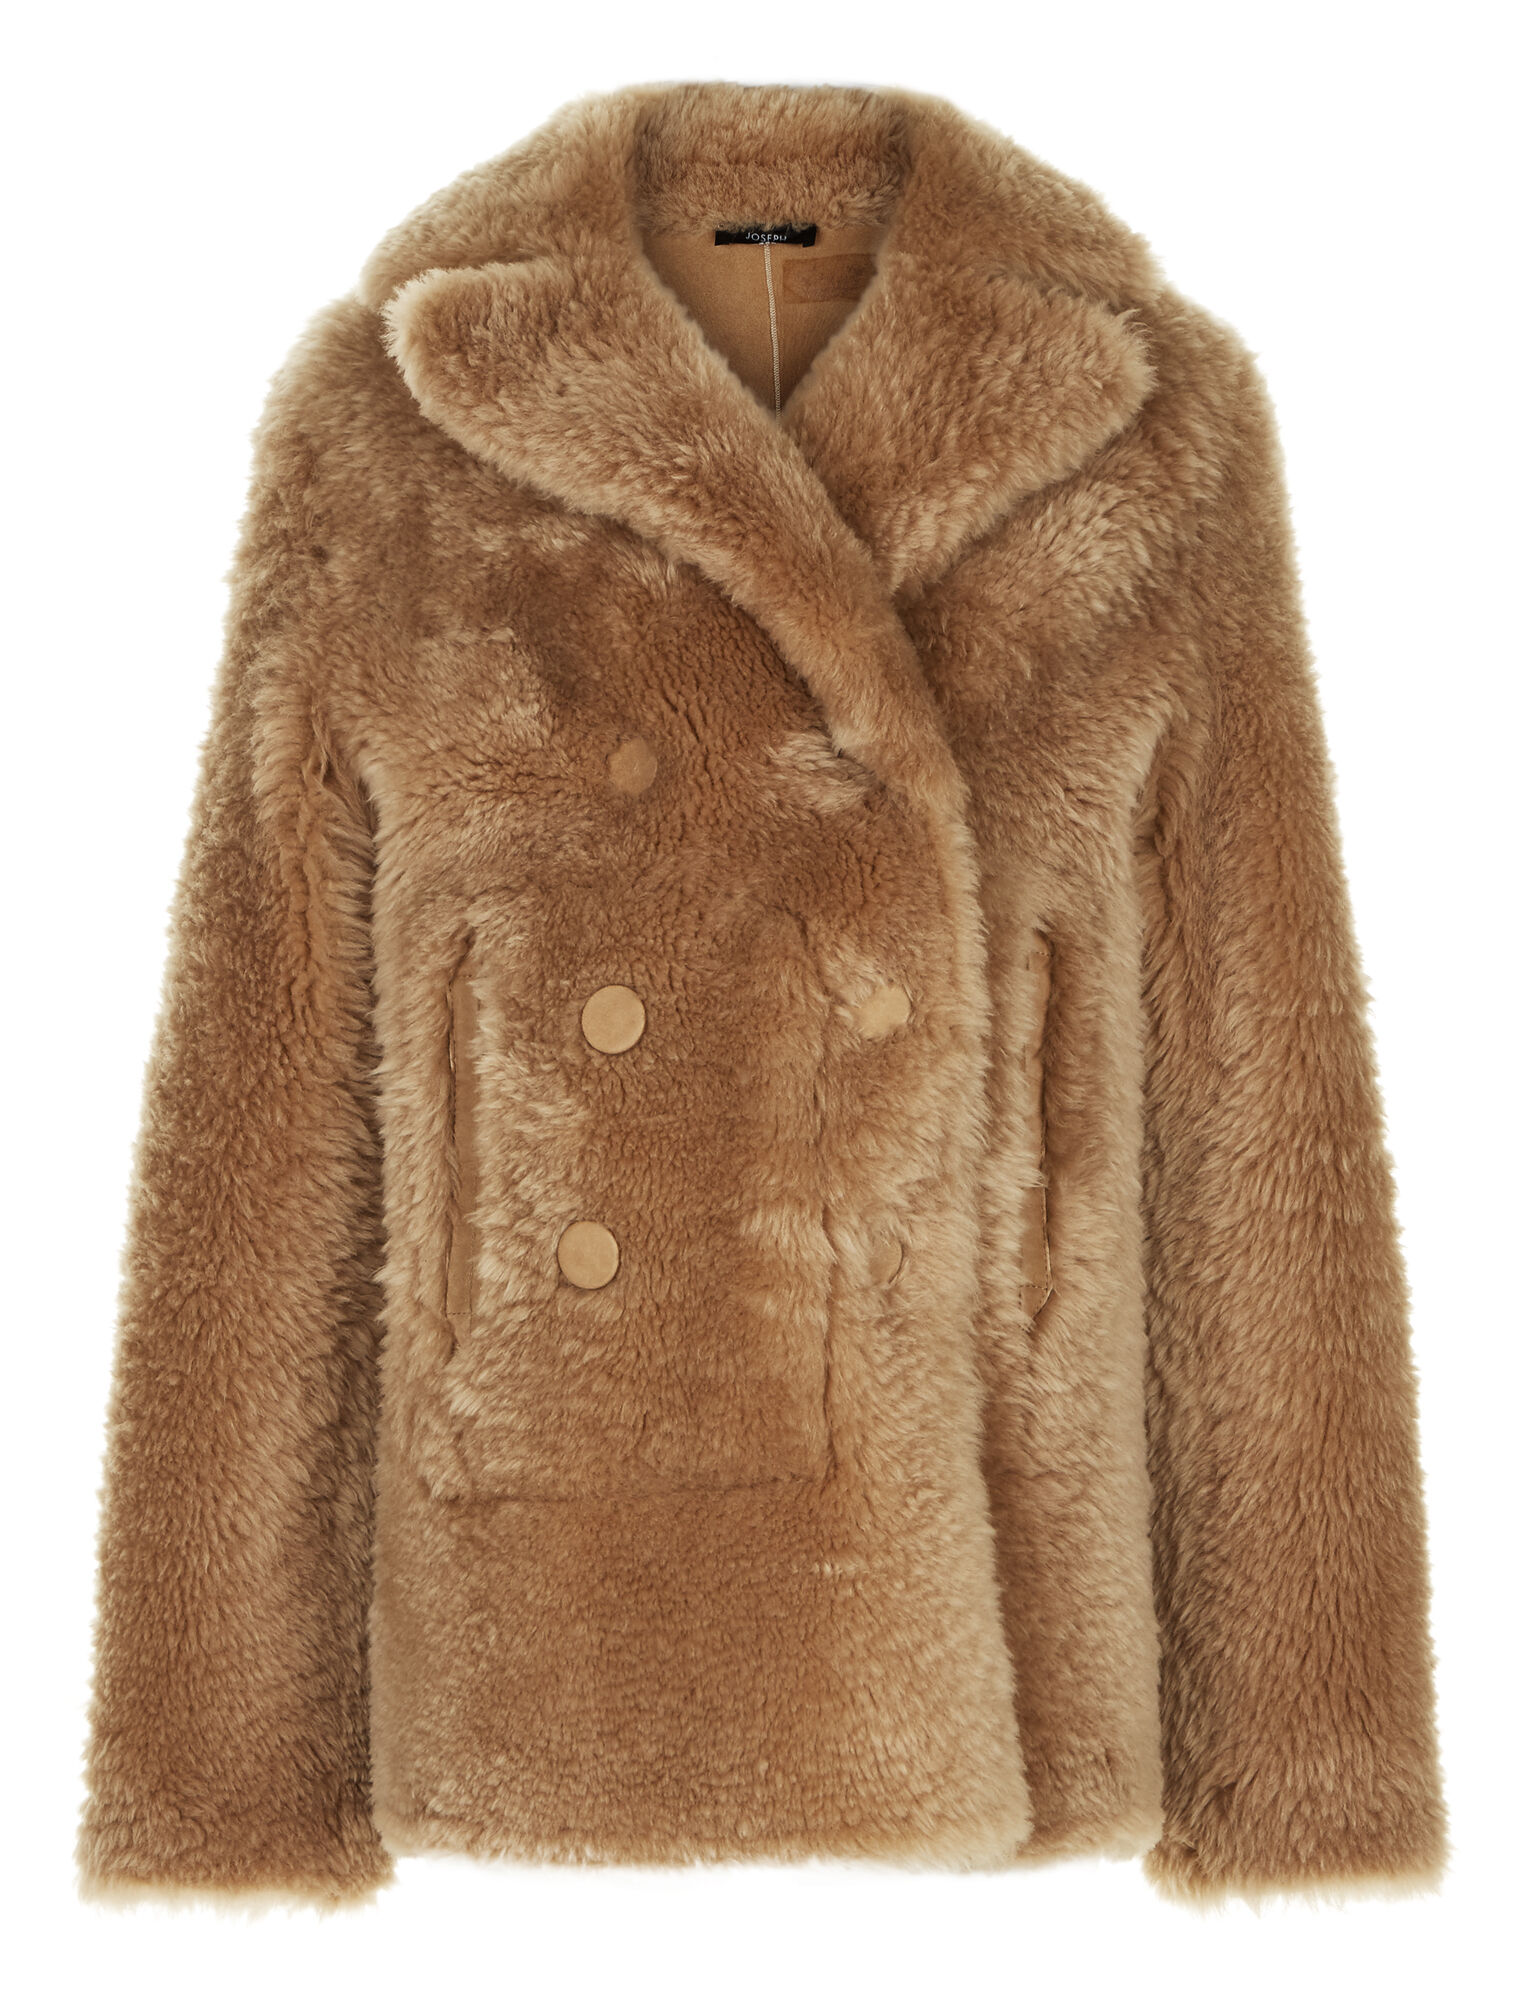 Joseph, New Hector Teddy Merinos Coat, in CAMEL